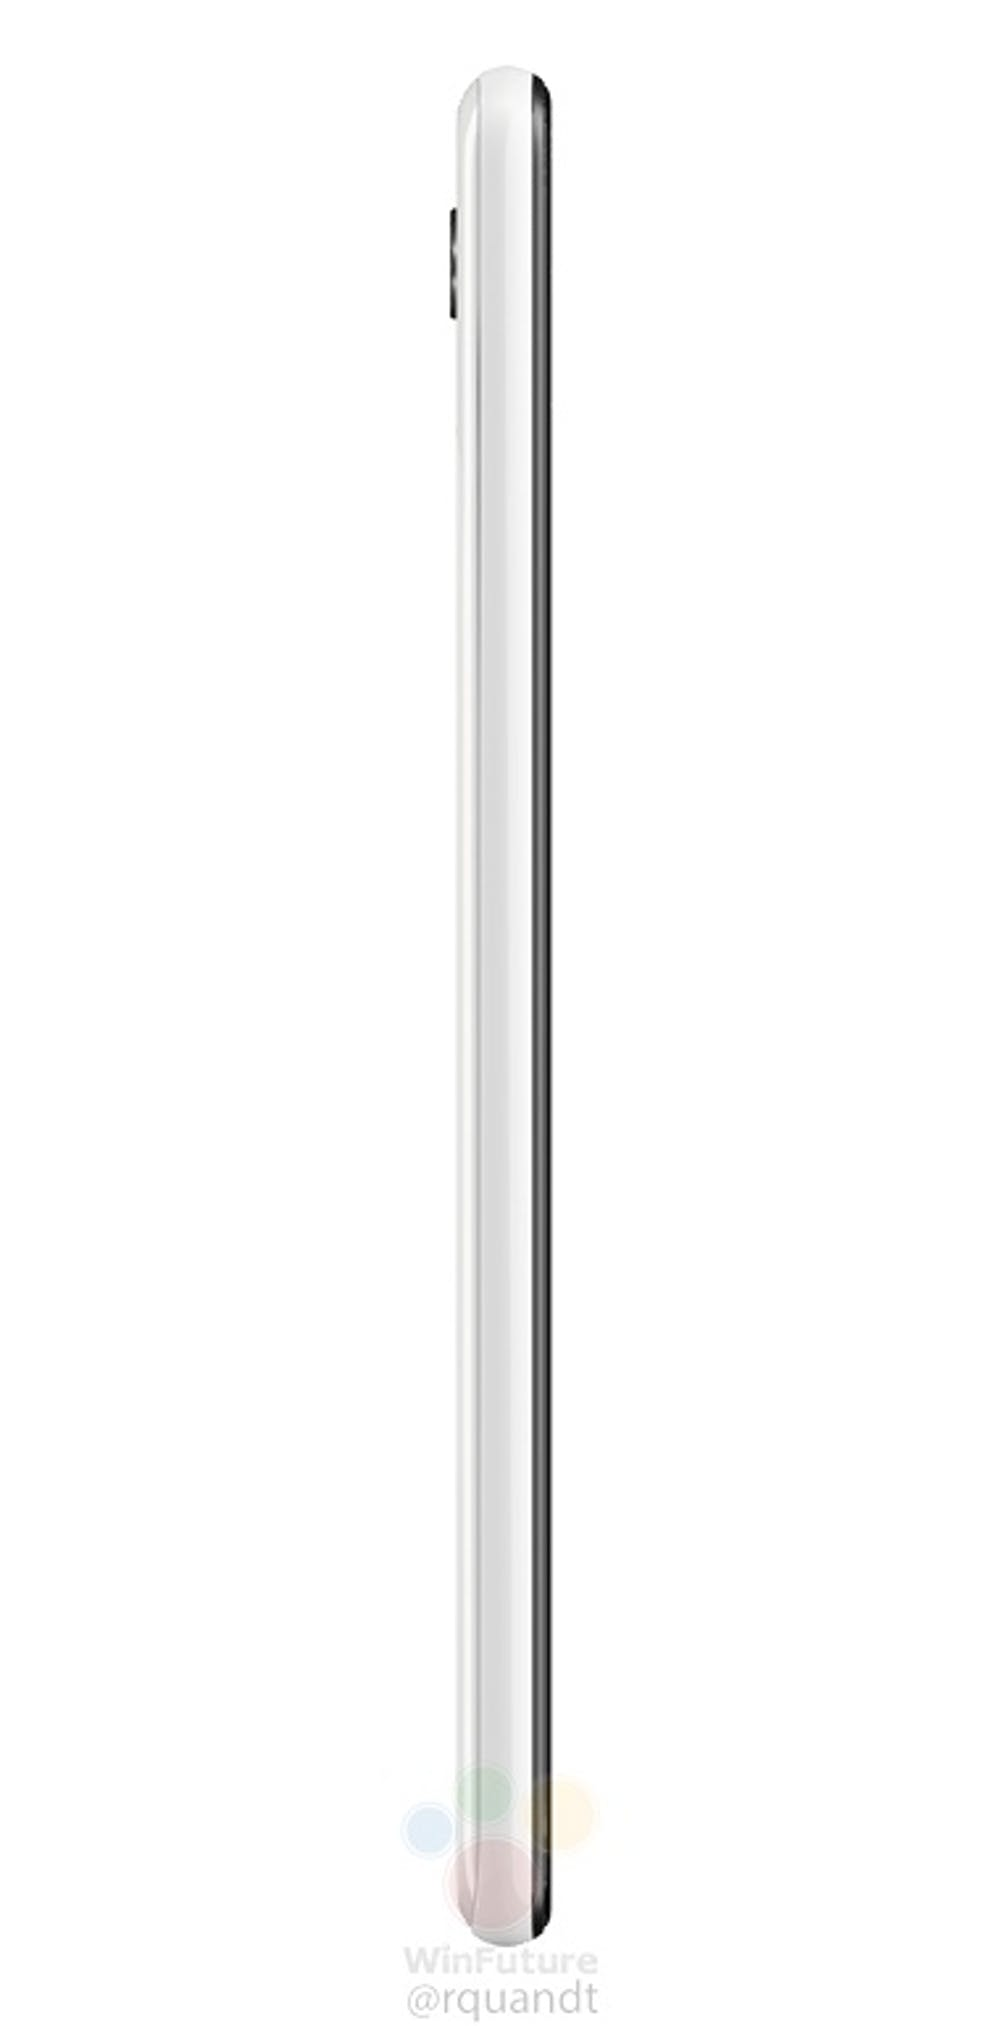 Pressebild des Google Pixel 3 XL. (Bild: Google; Winfuture